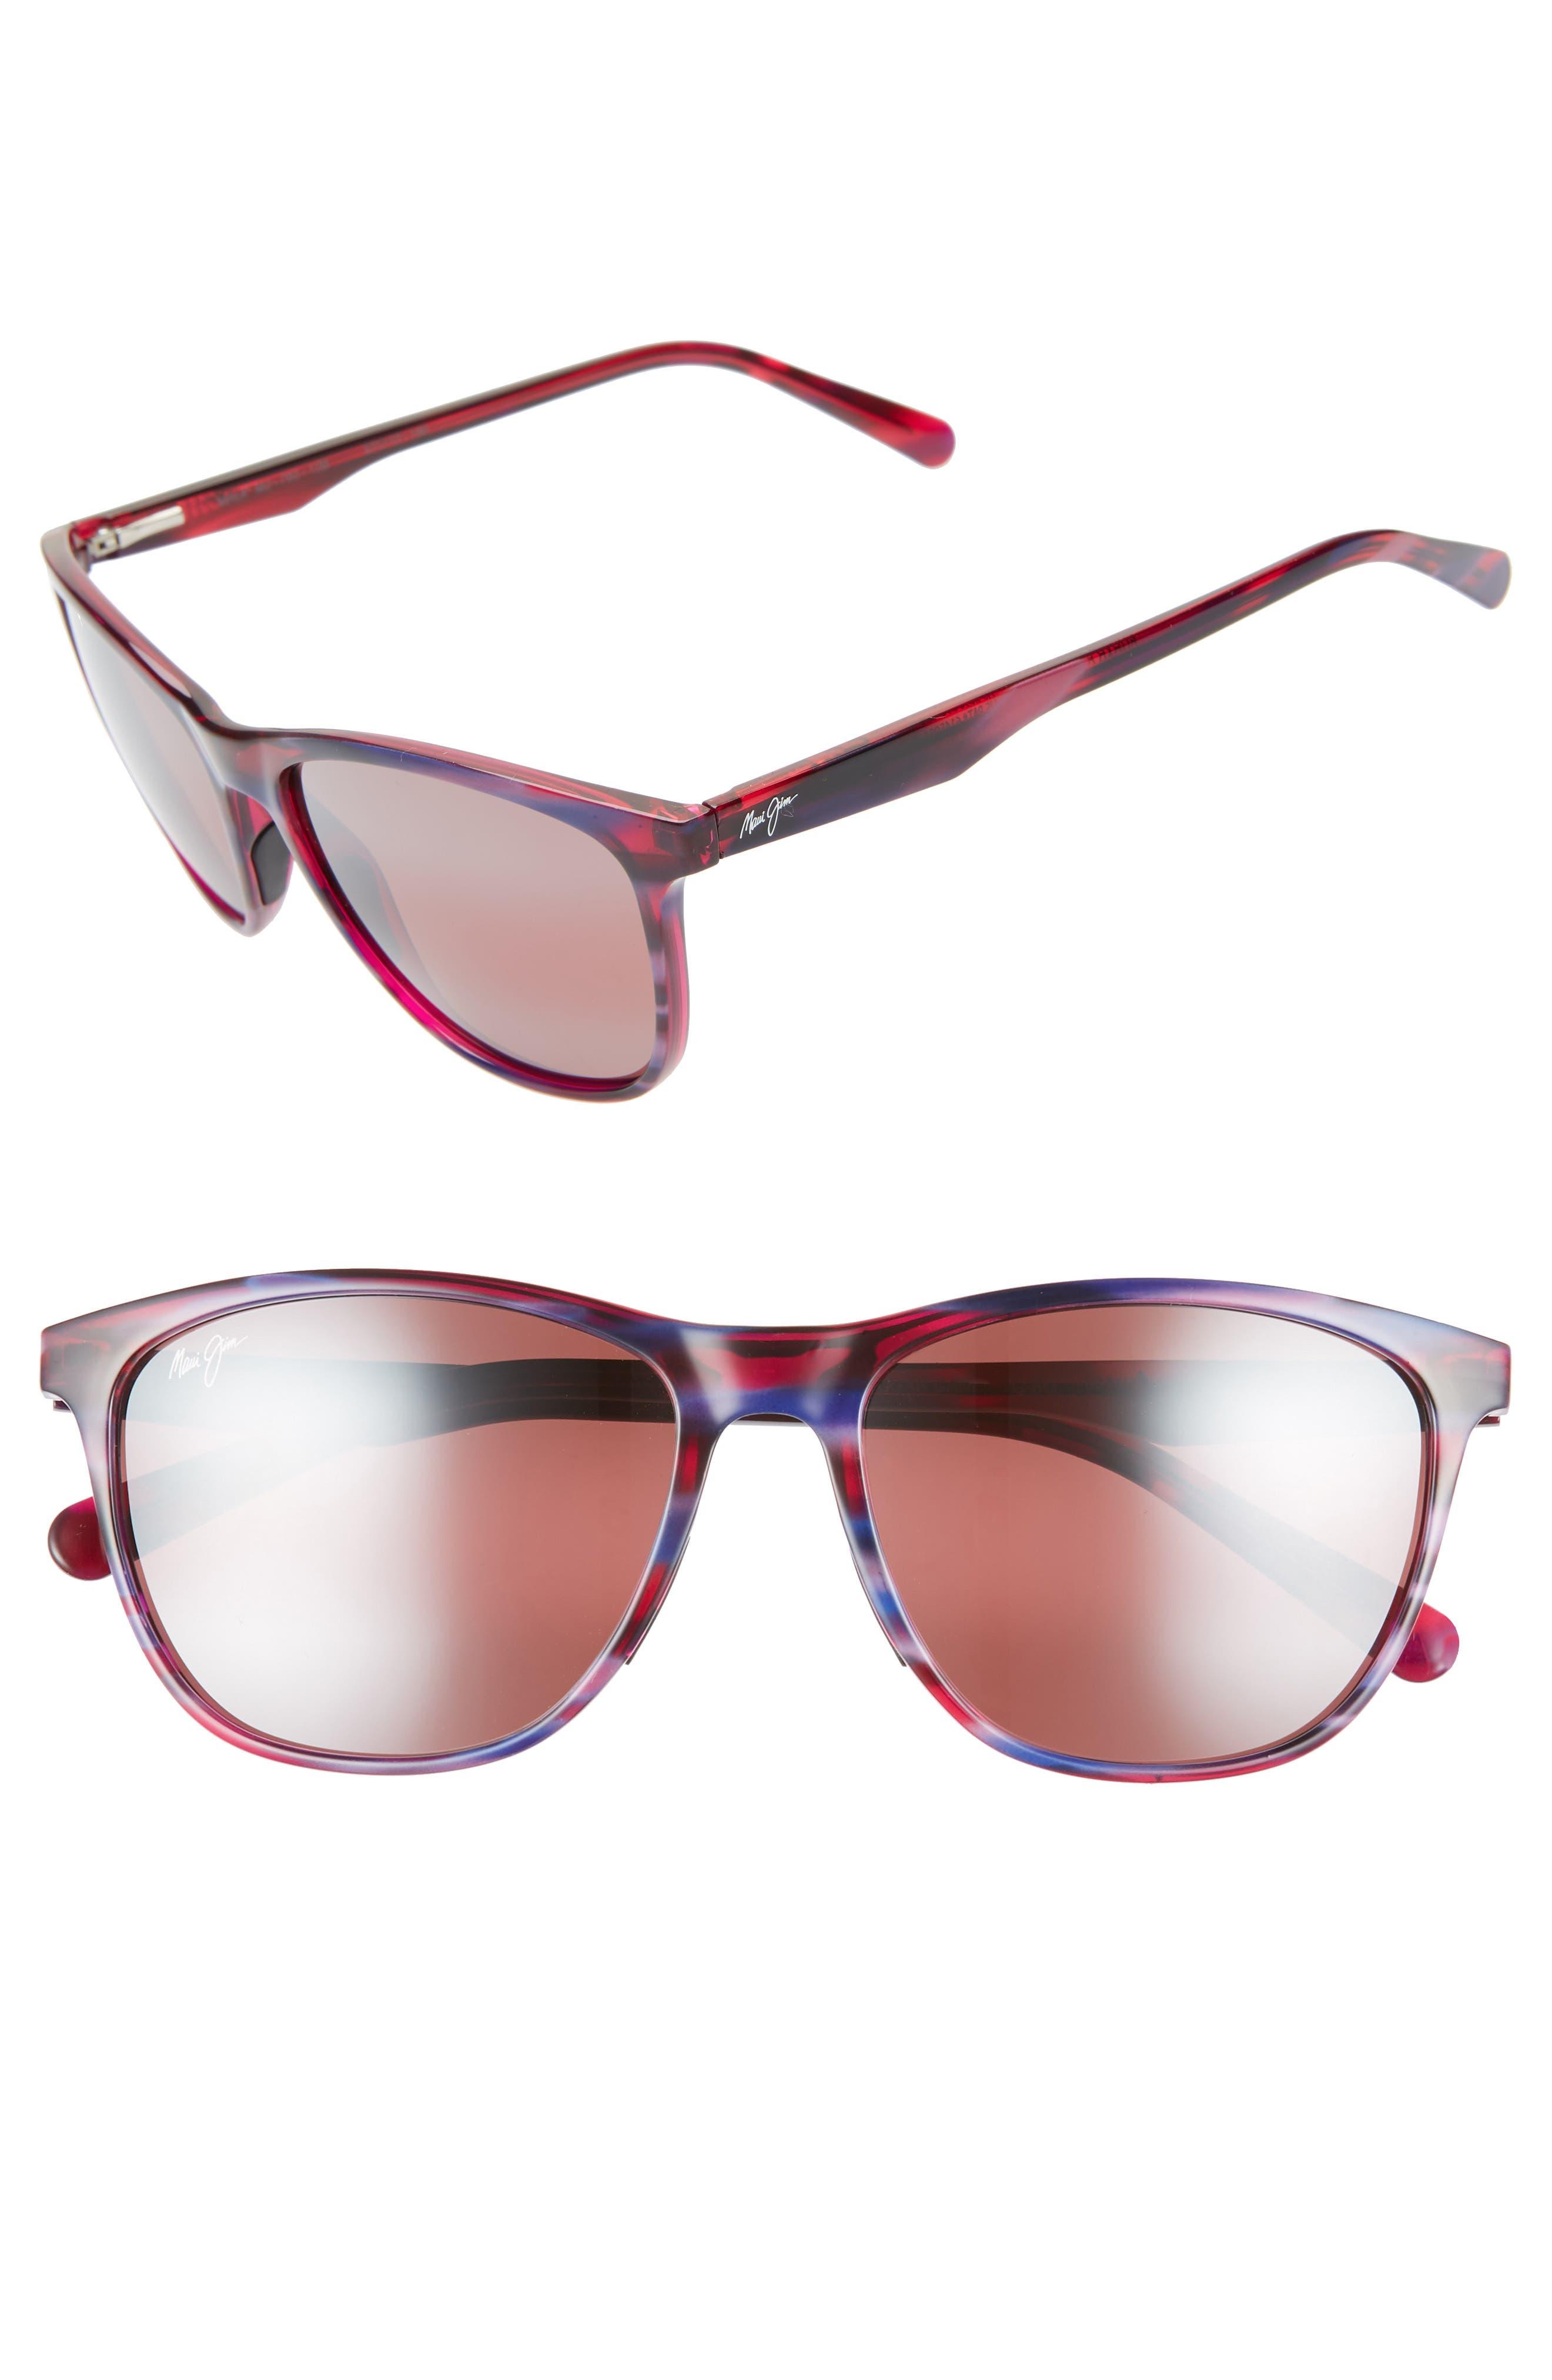 Maui Jim Sugar Cane 57Mm Polarizedplus2 Sunglasses - Lilac Sunset/ Maui Rose